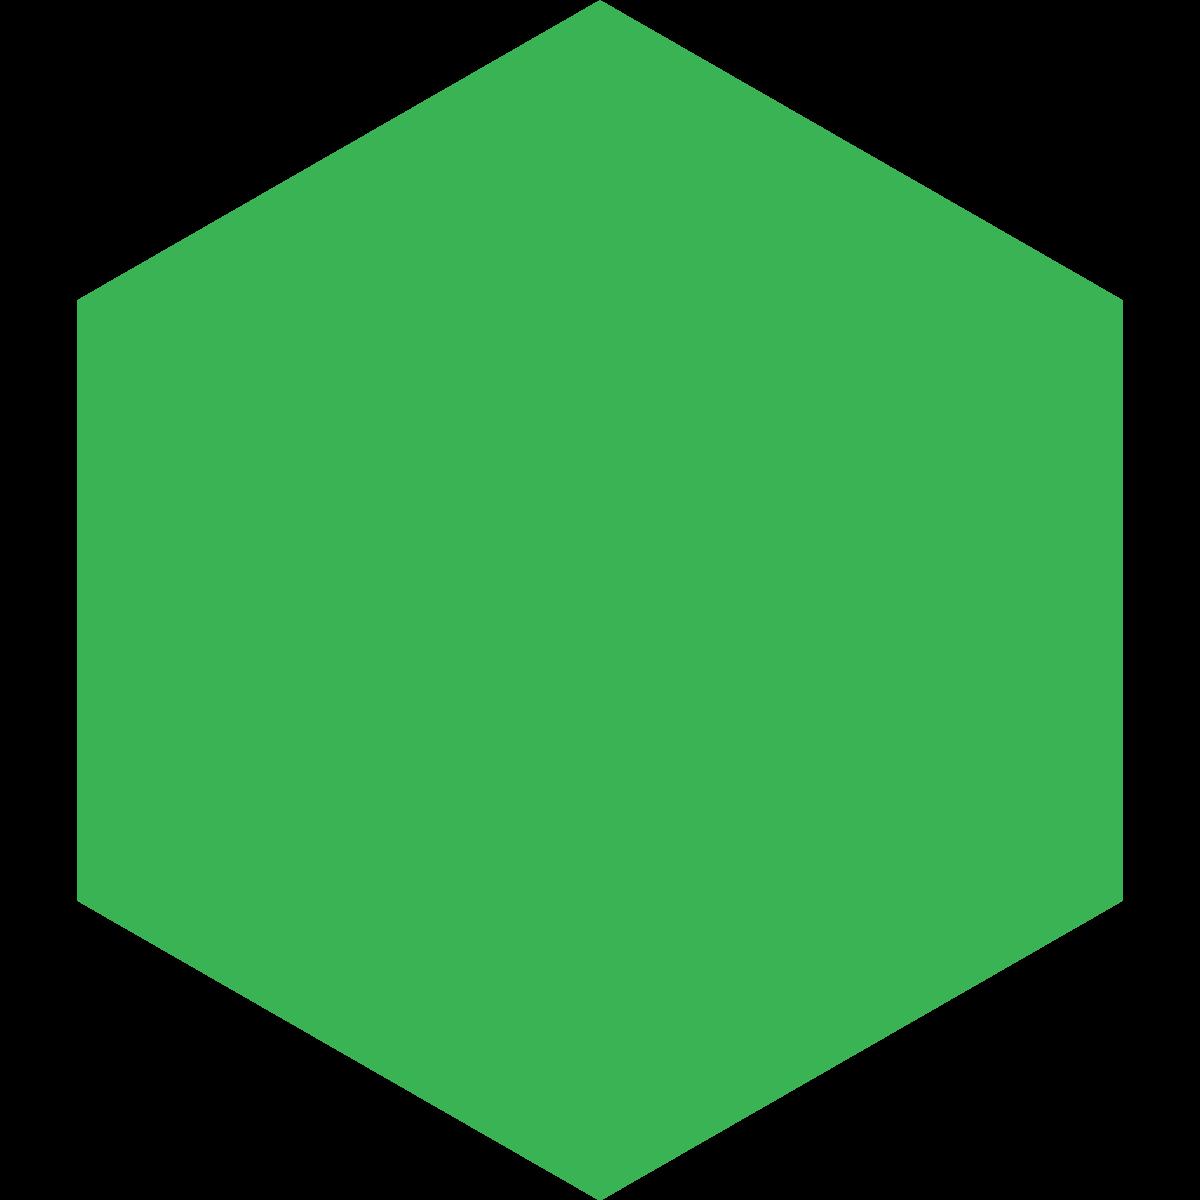 Hexagon clipart green Design Dat svg Download